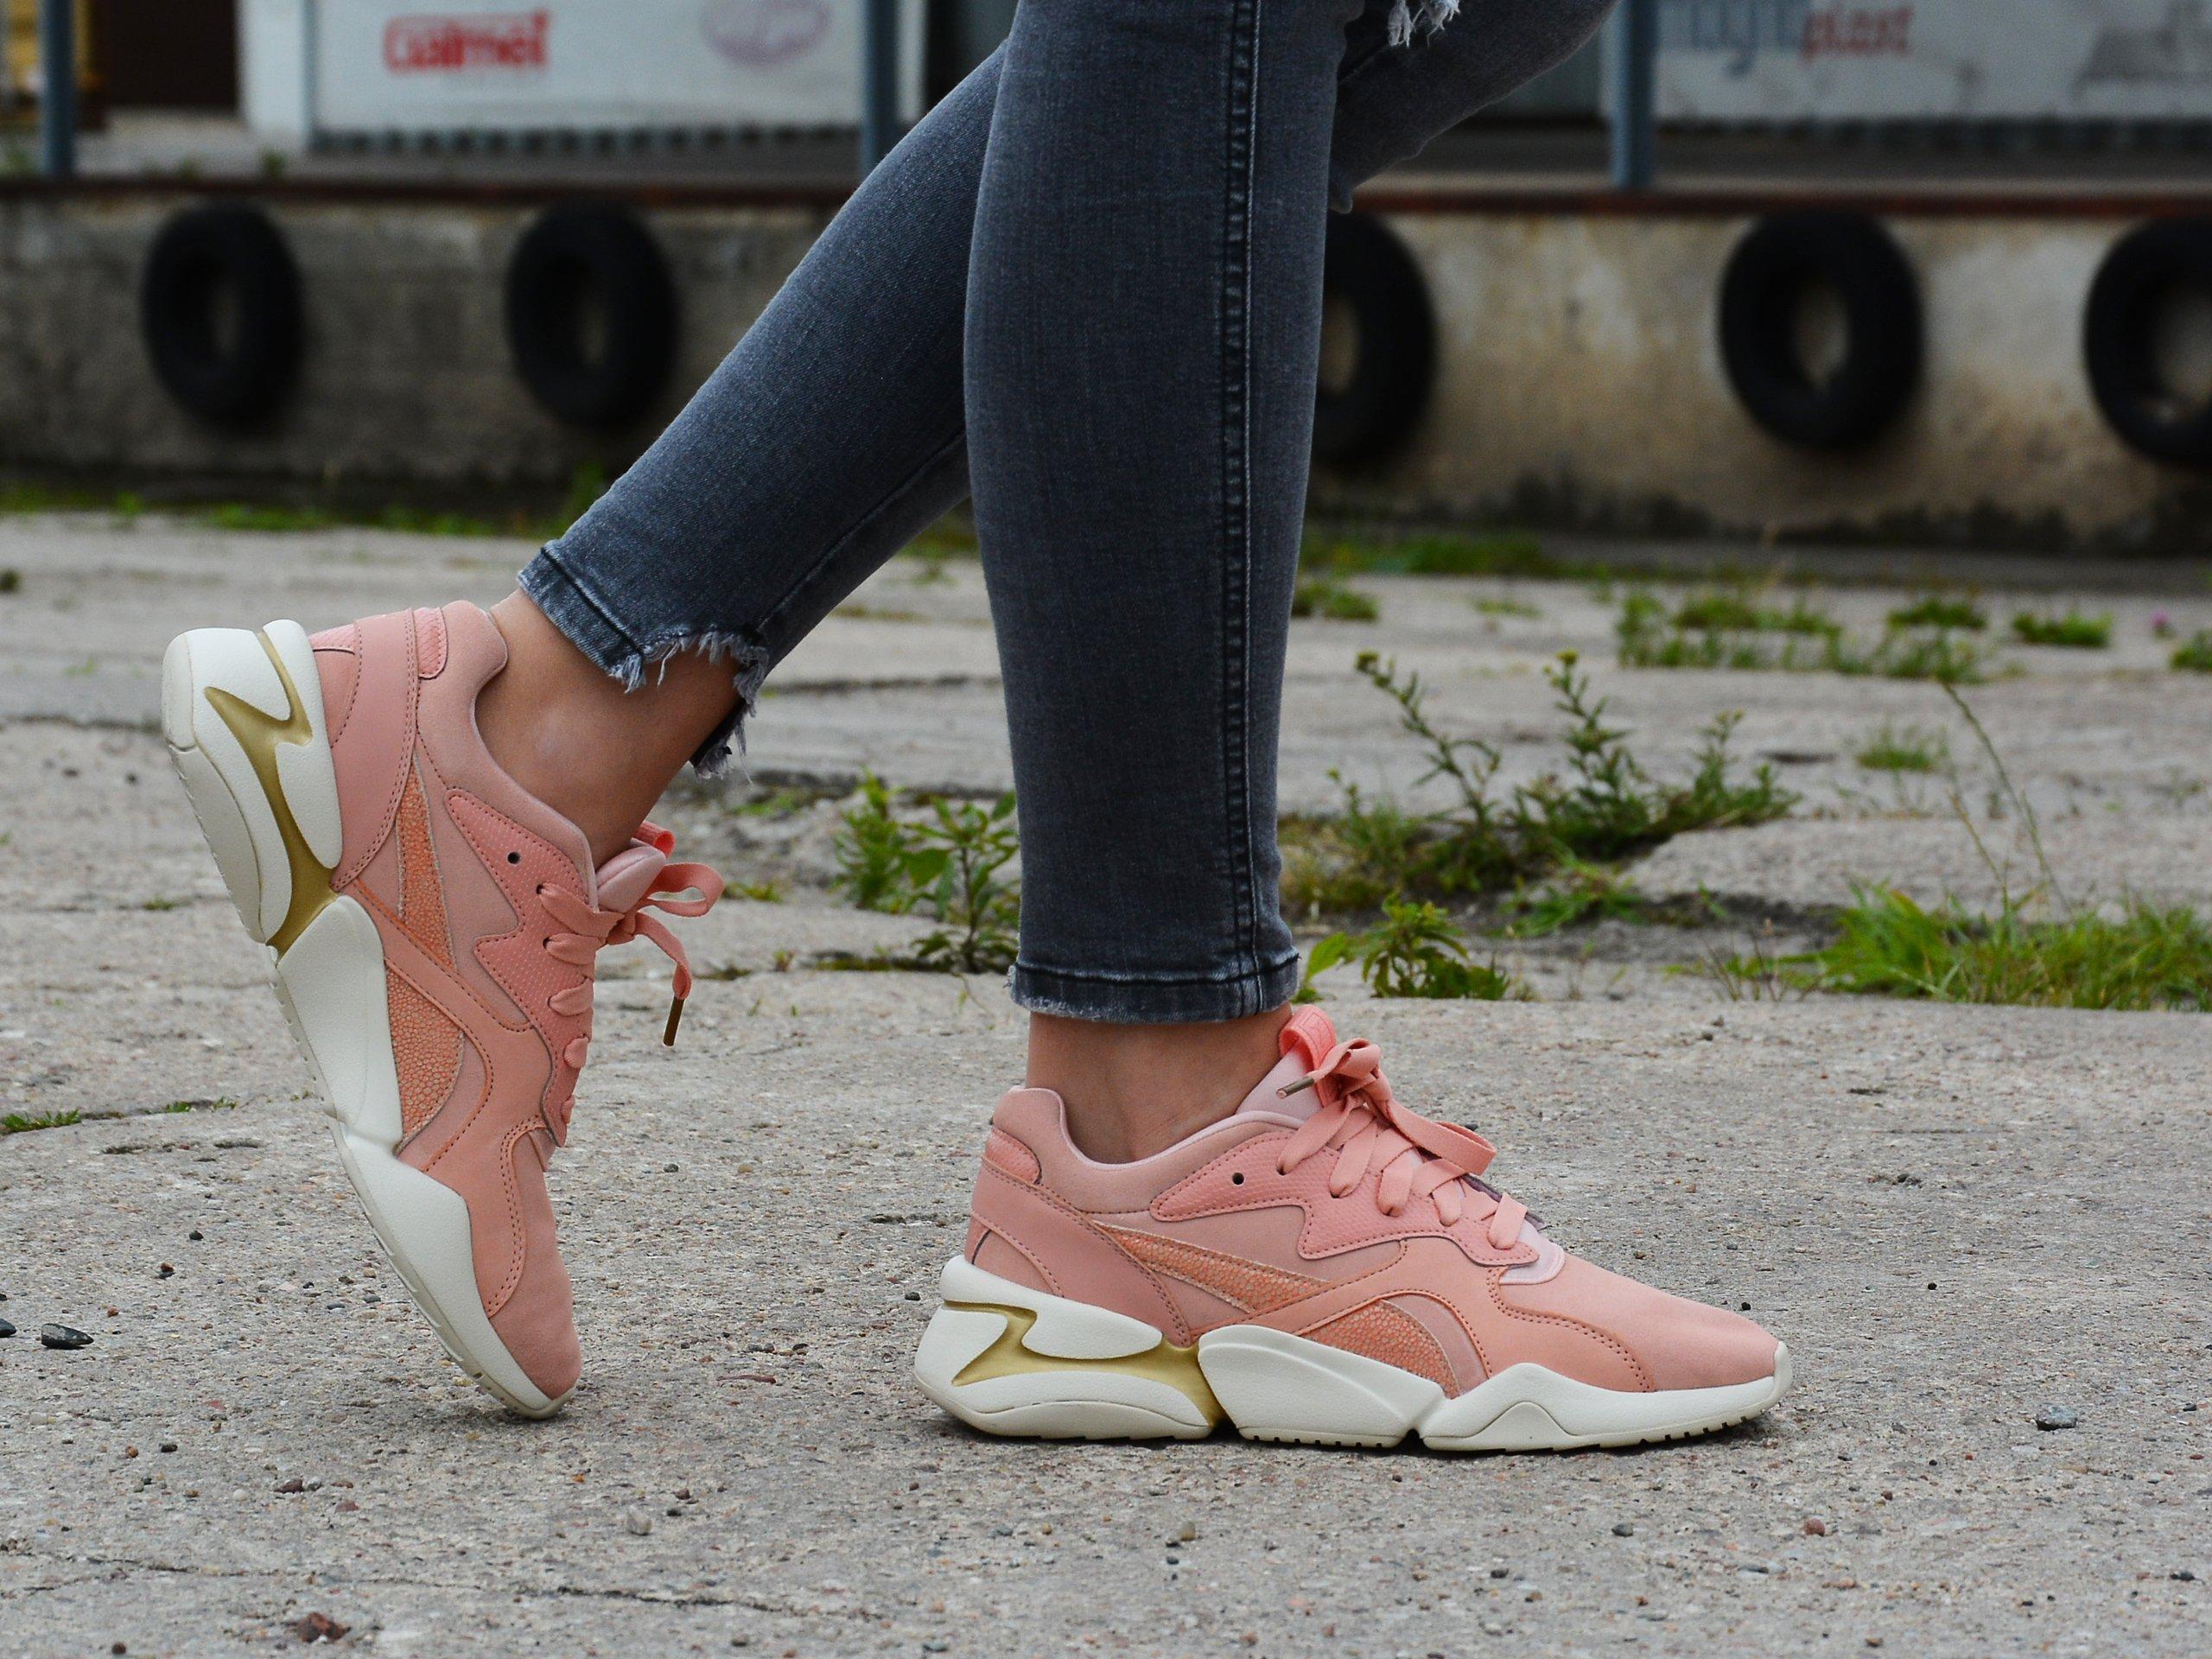 Puma - Nova Pastel Grunge 369487-03 - Sneakers - Pink Łososiowy ...